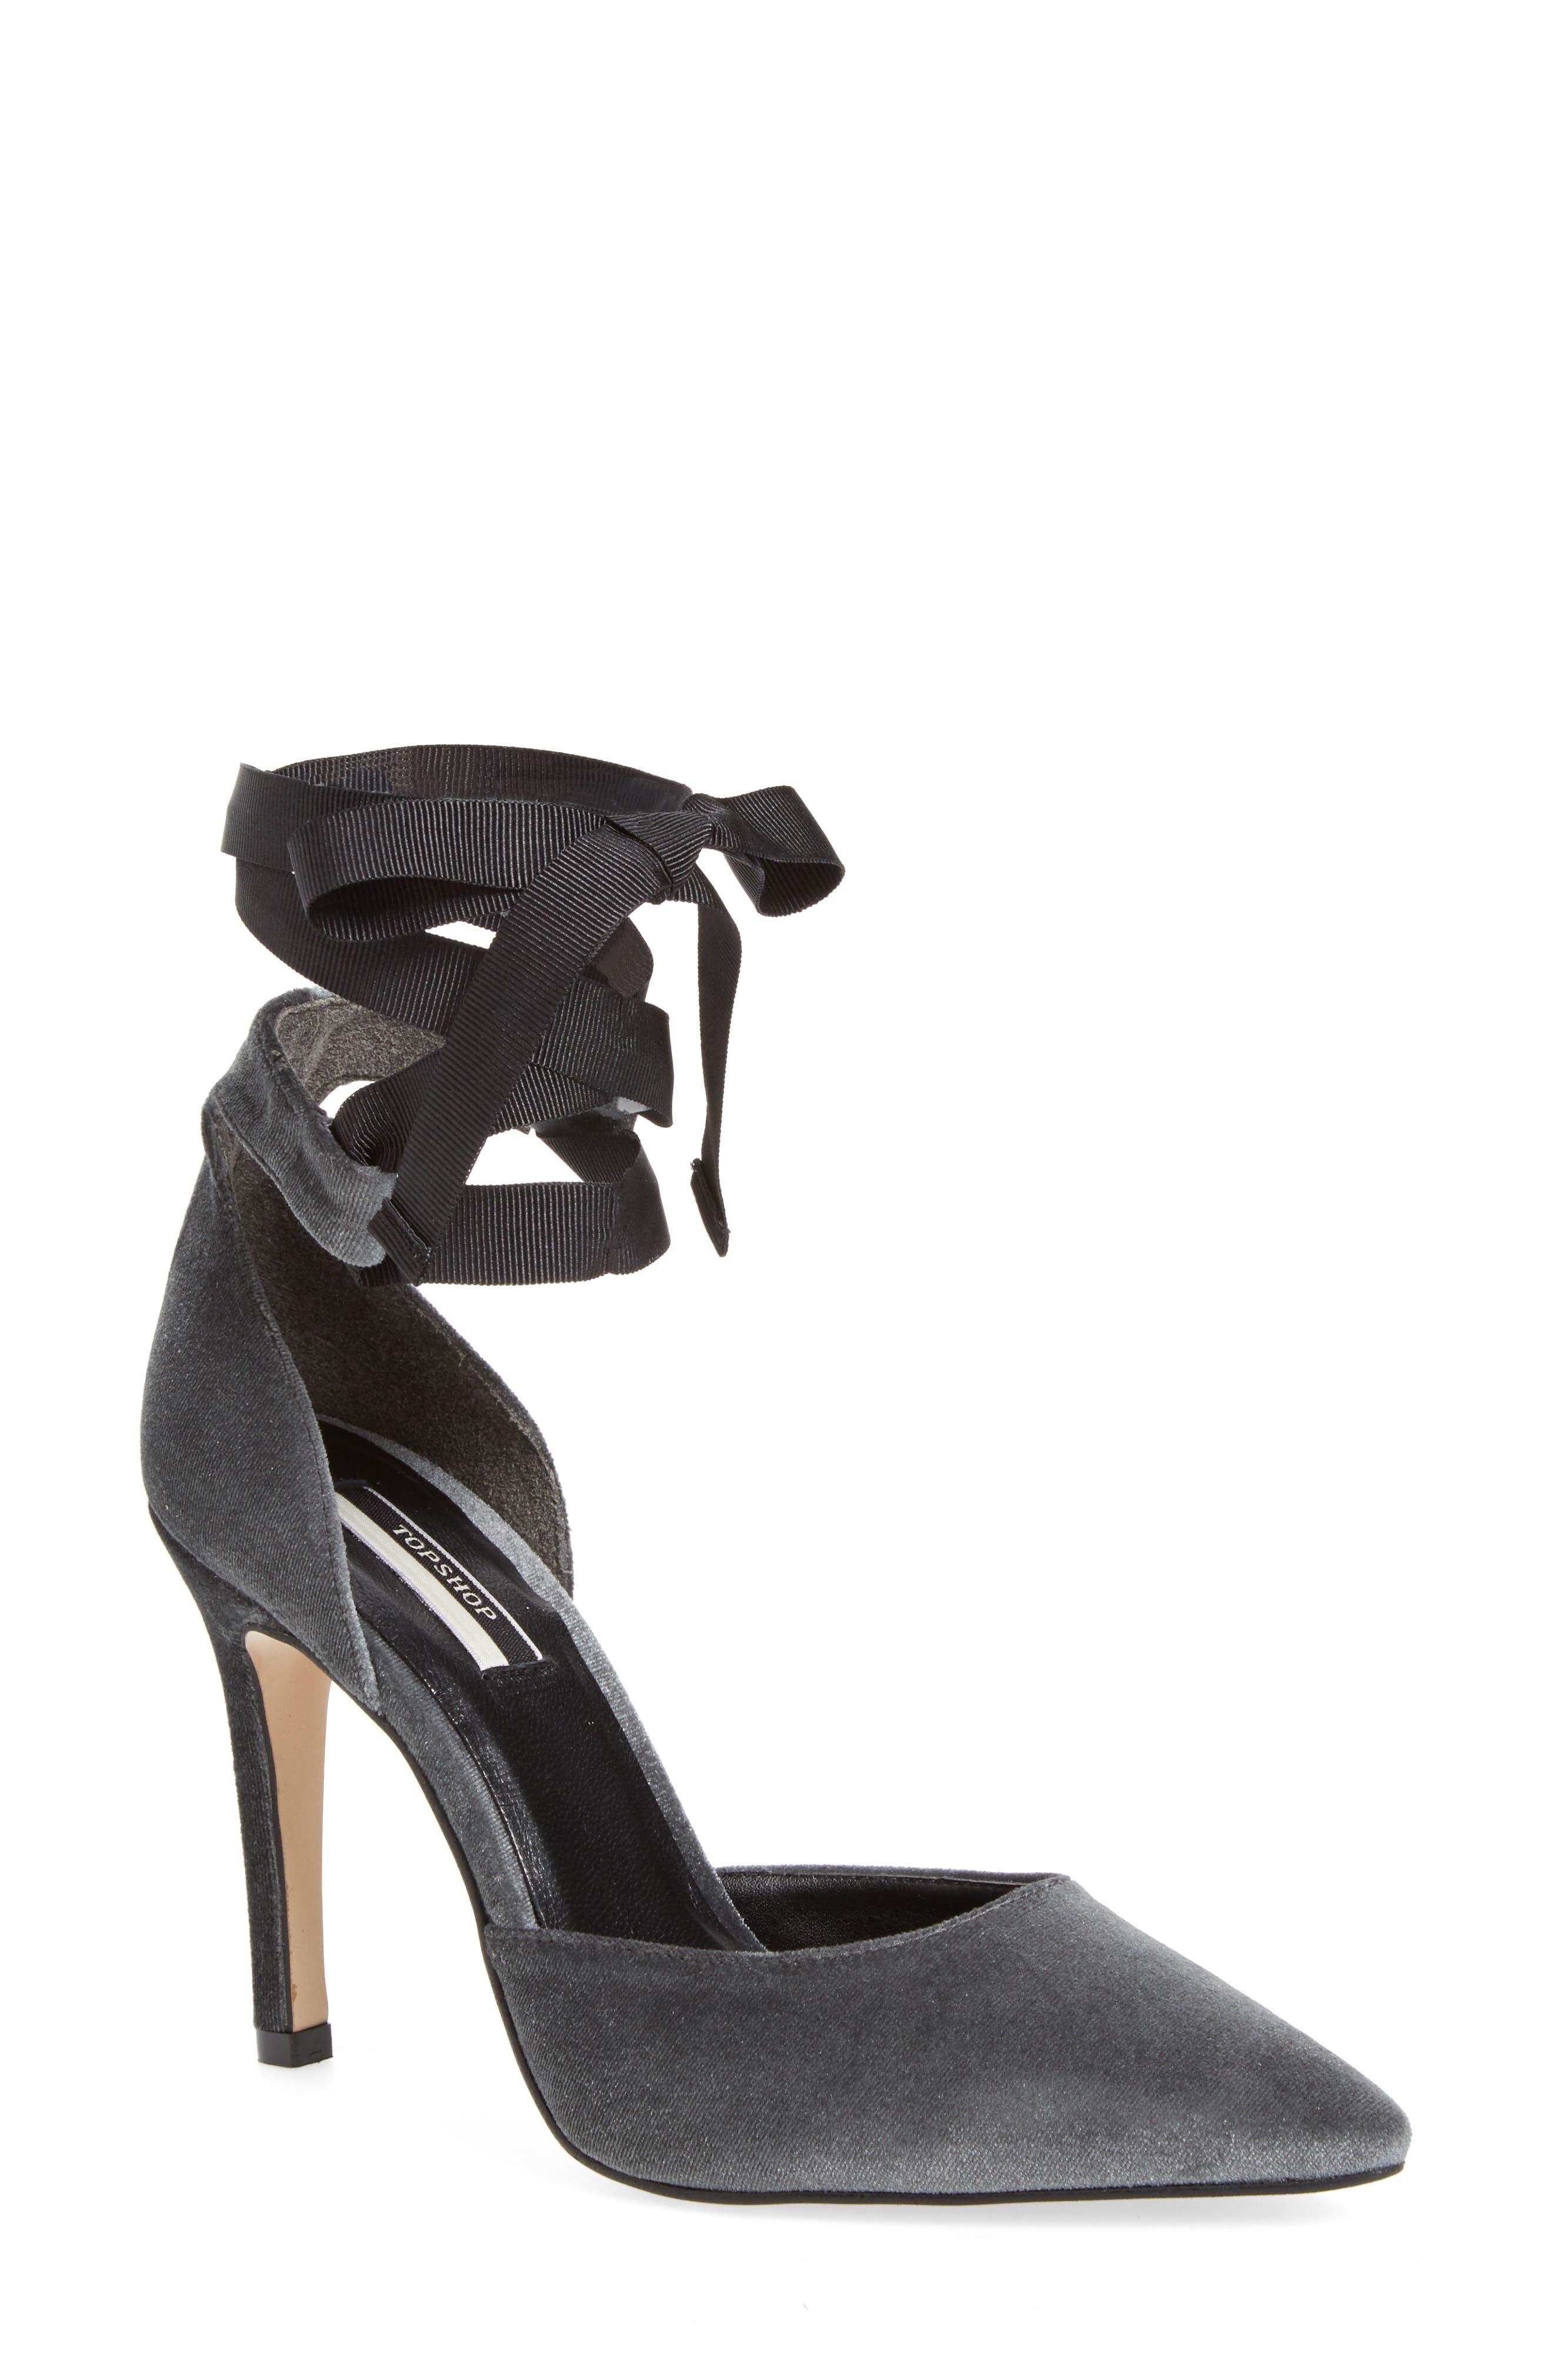 Main Image - Topshop Graceful Ankle Tie d'Orsay Pump (Women)